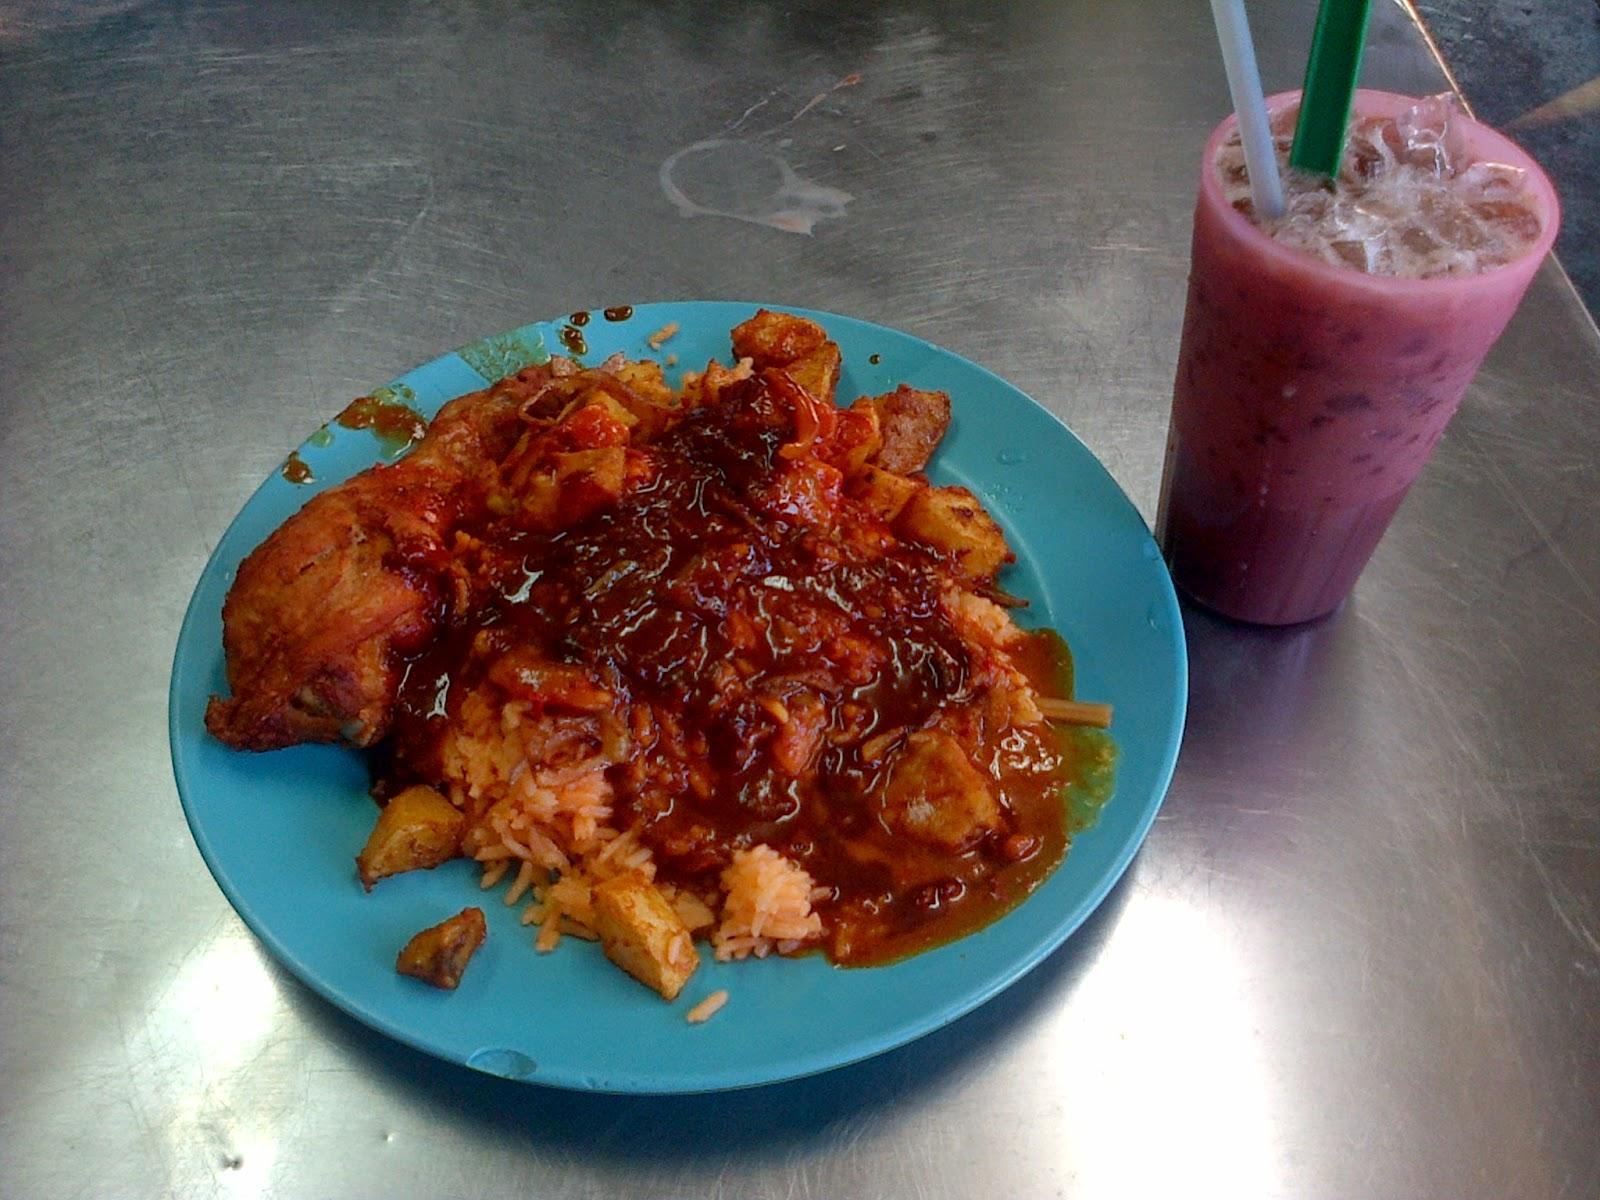 Nasi tomato tarzan, sedap baq hang, Nasi minyak, awesome food, nusantara,